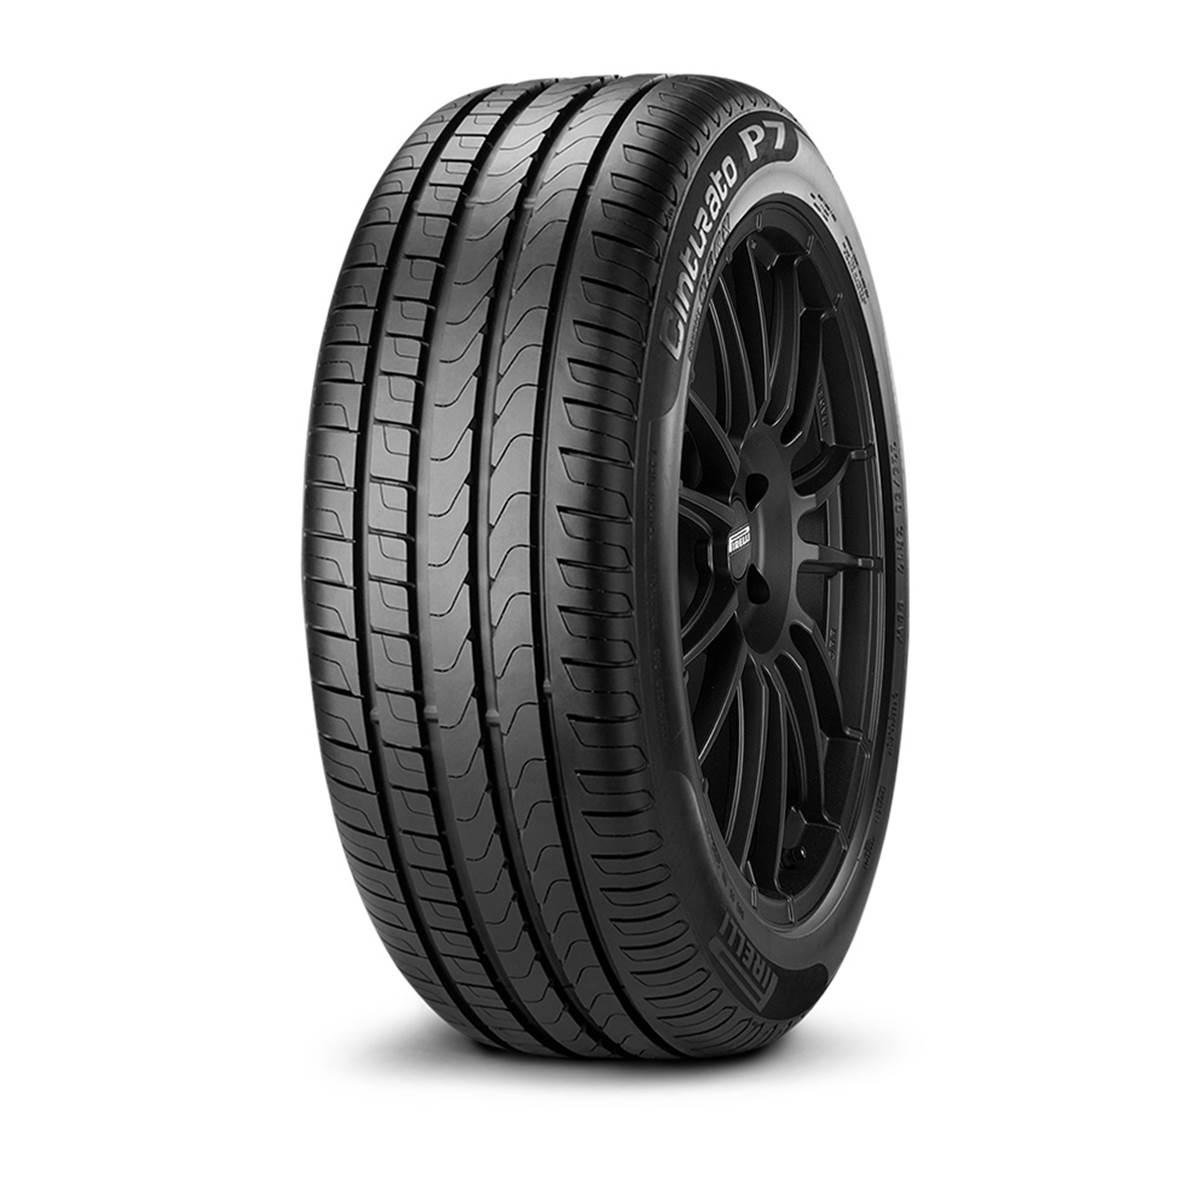 Pneu Pirelli 225/50R16 92V Cinturato P7